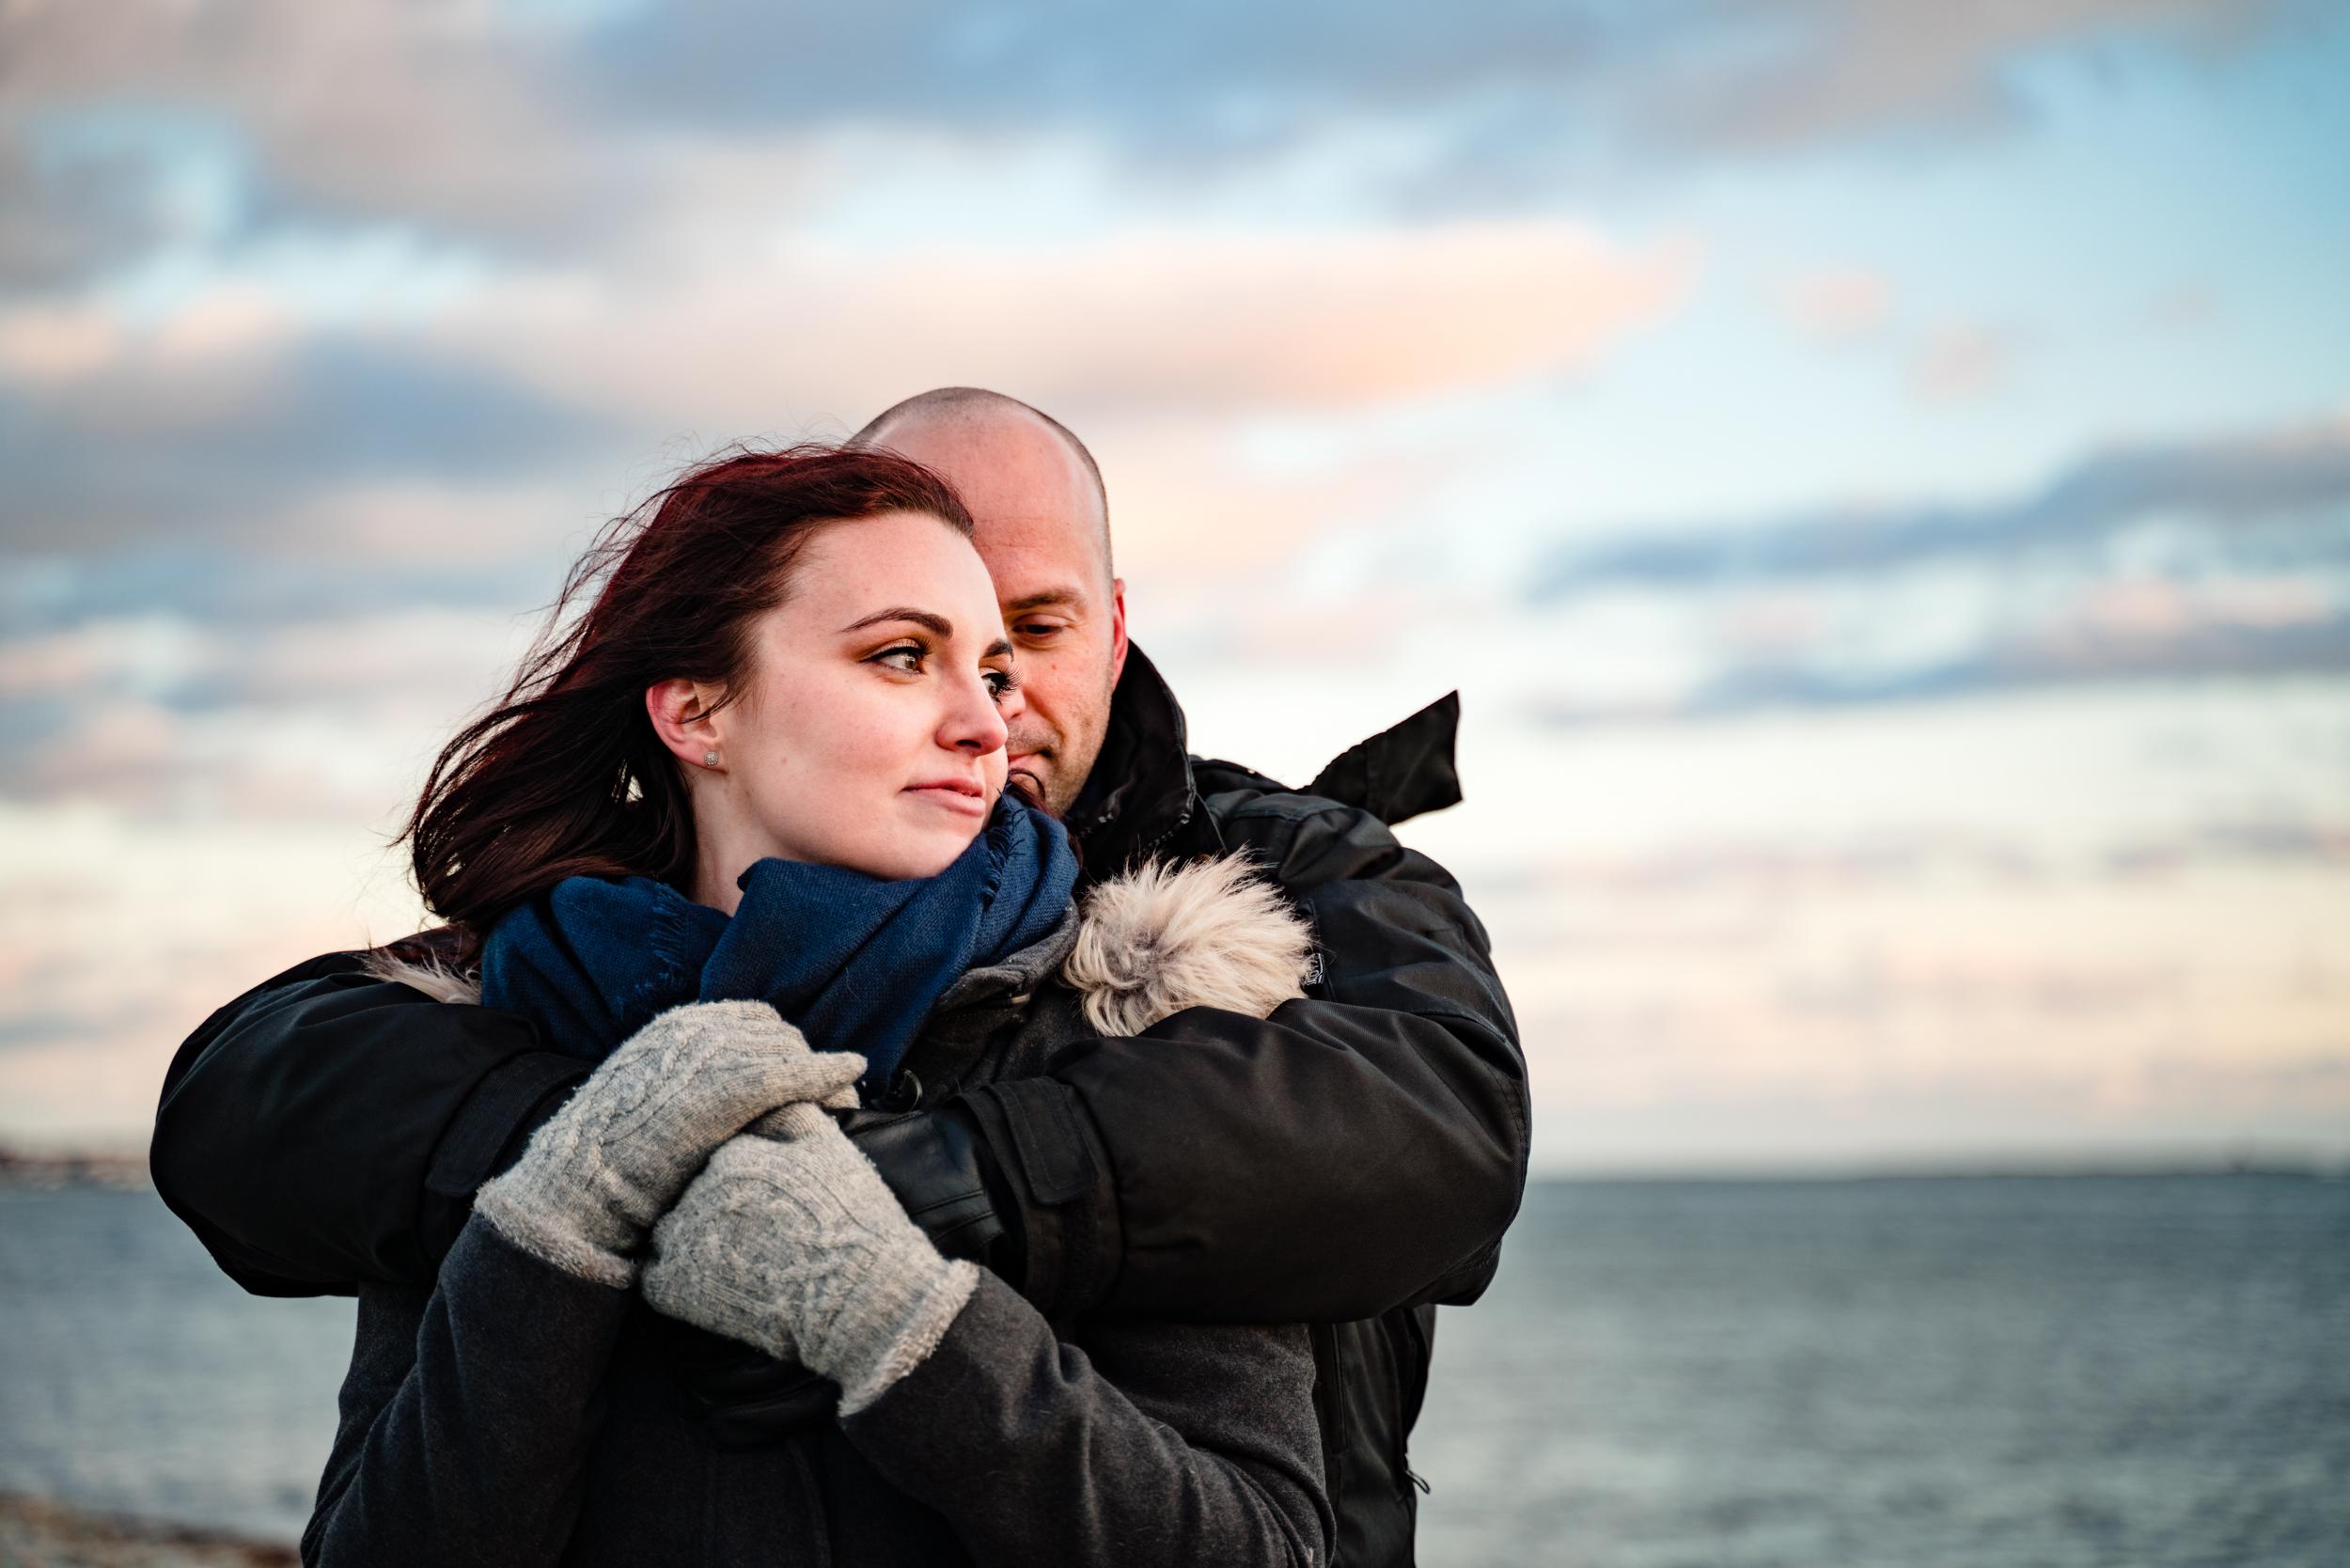 Sarah&Shayne-Halifax-engagement-weddingphotography-weddingphotographers-novascotia (31 of 41).jpg